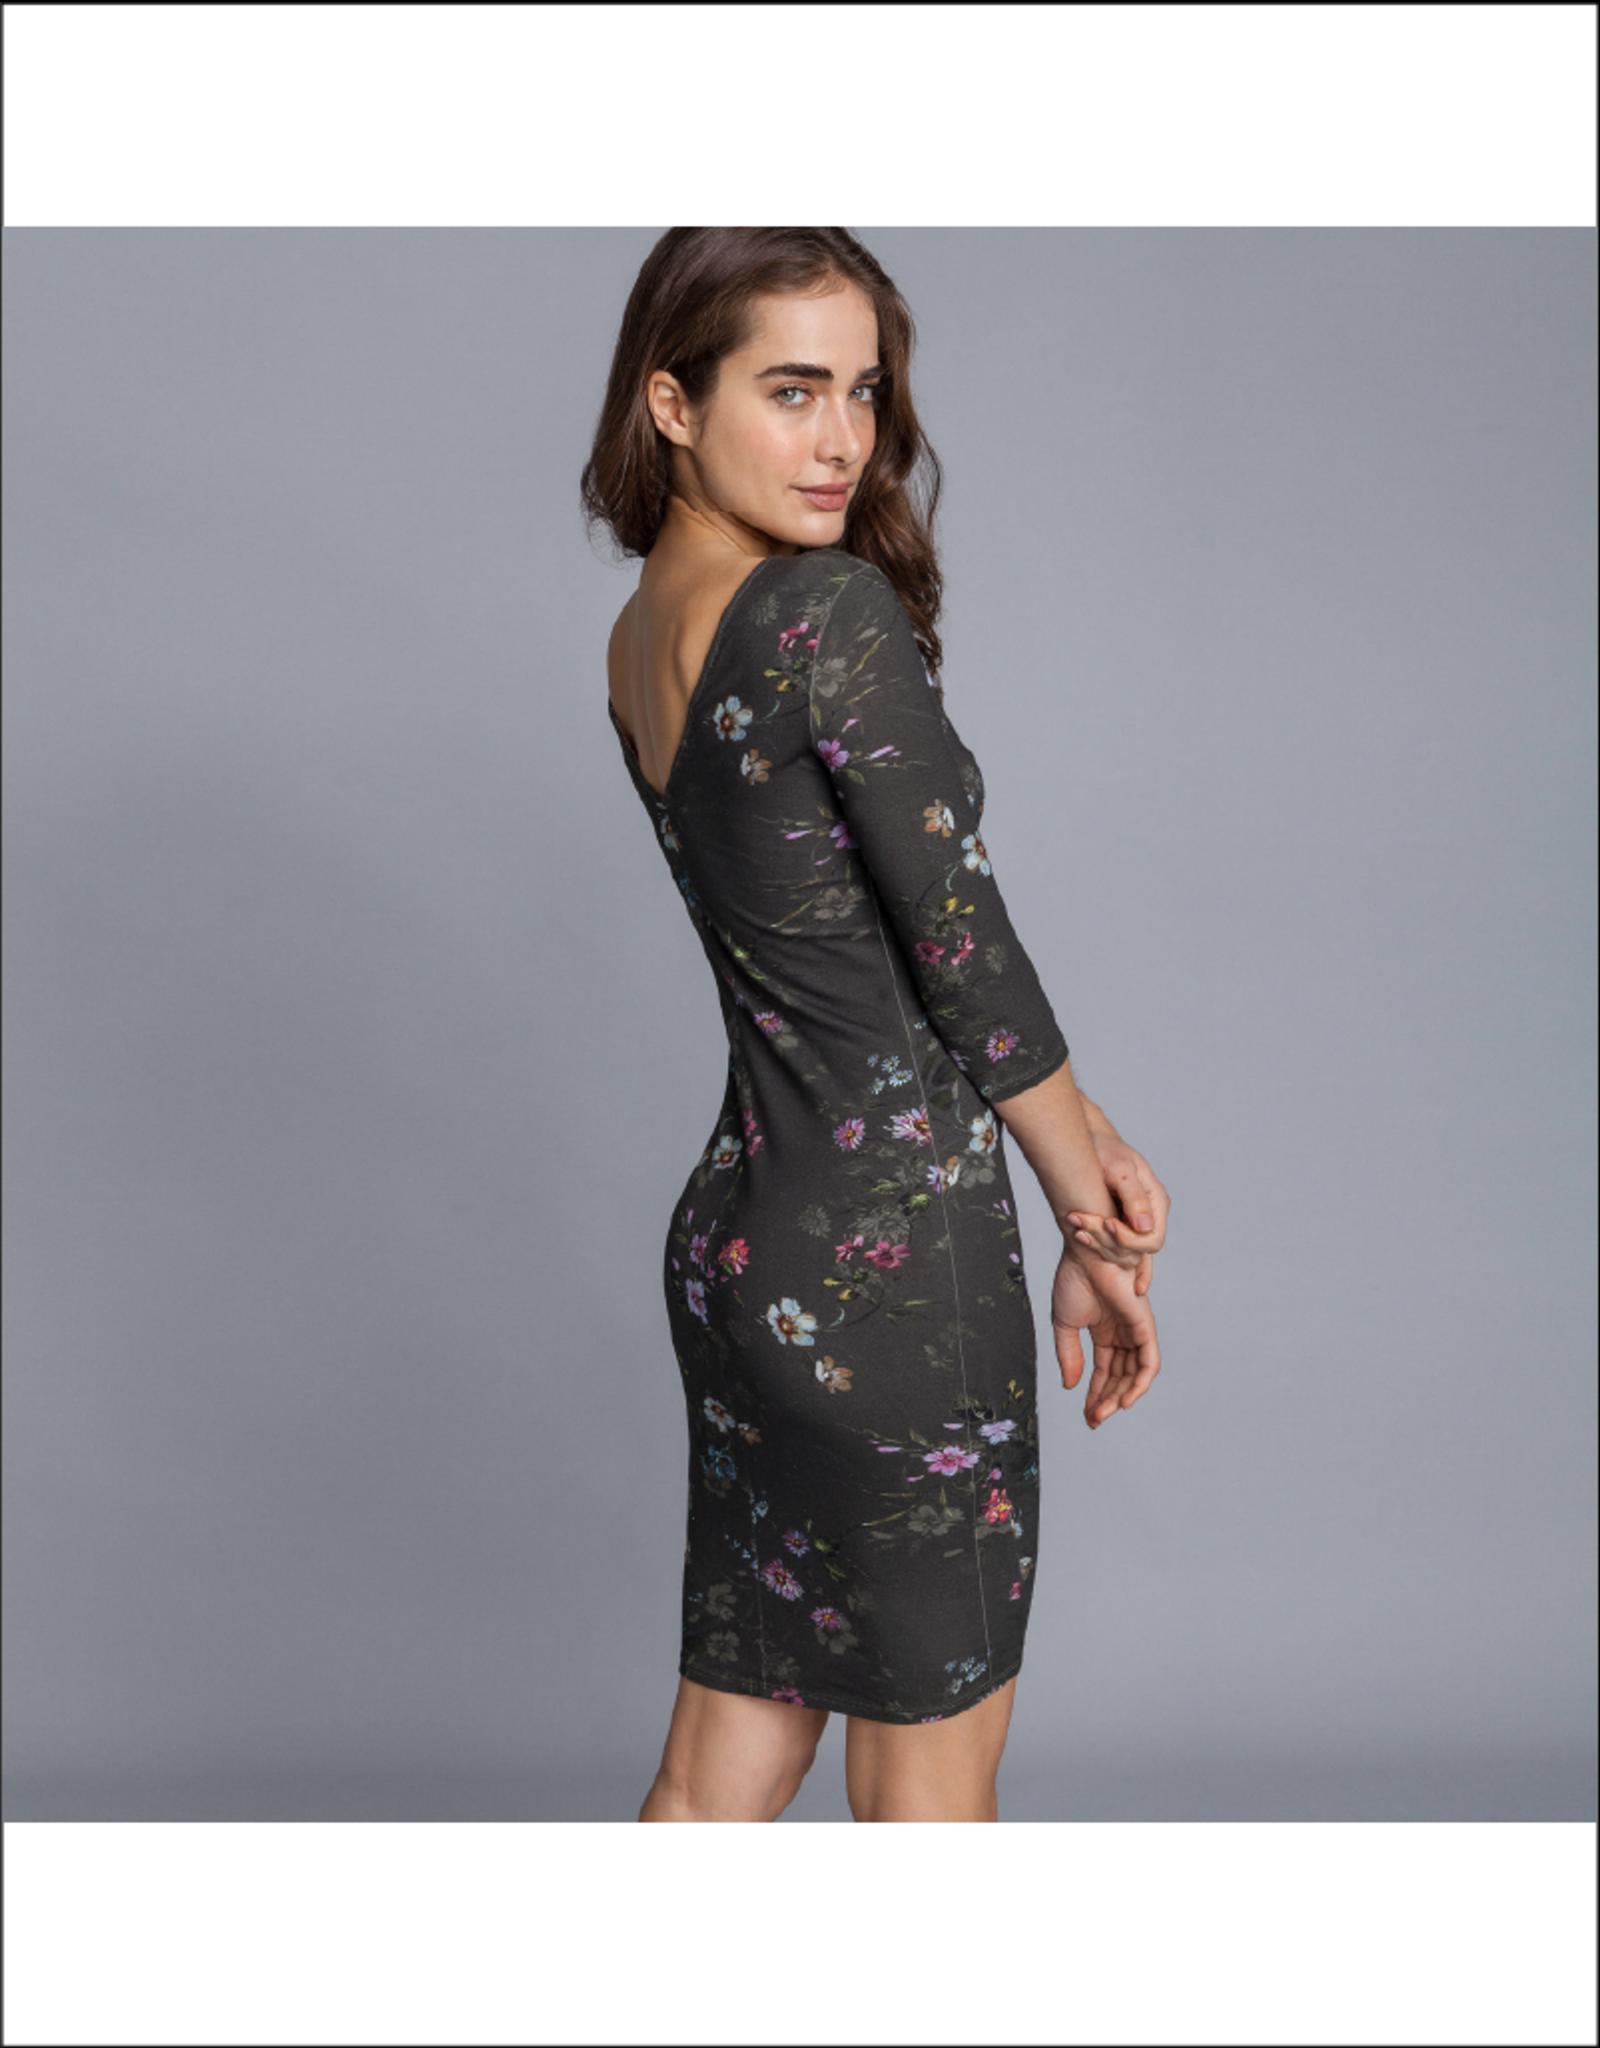 Lezalez V-Back Printed 3/4 Sleeve Bodycon Dress